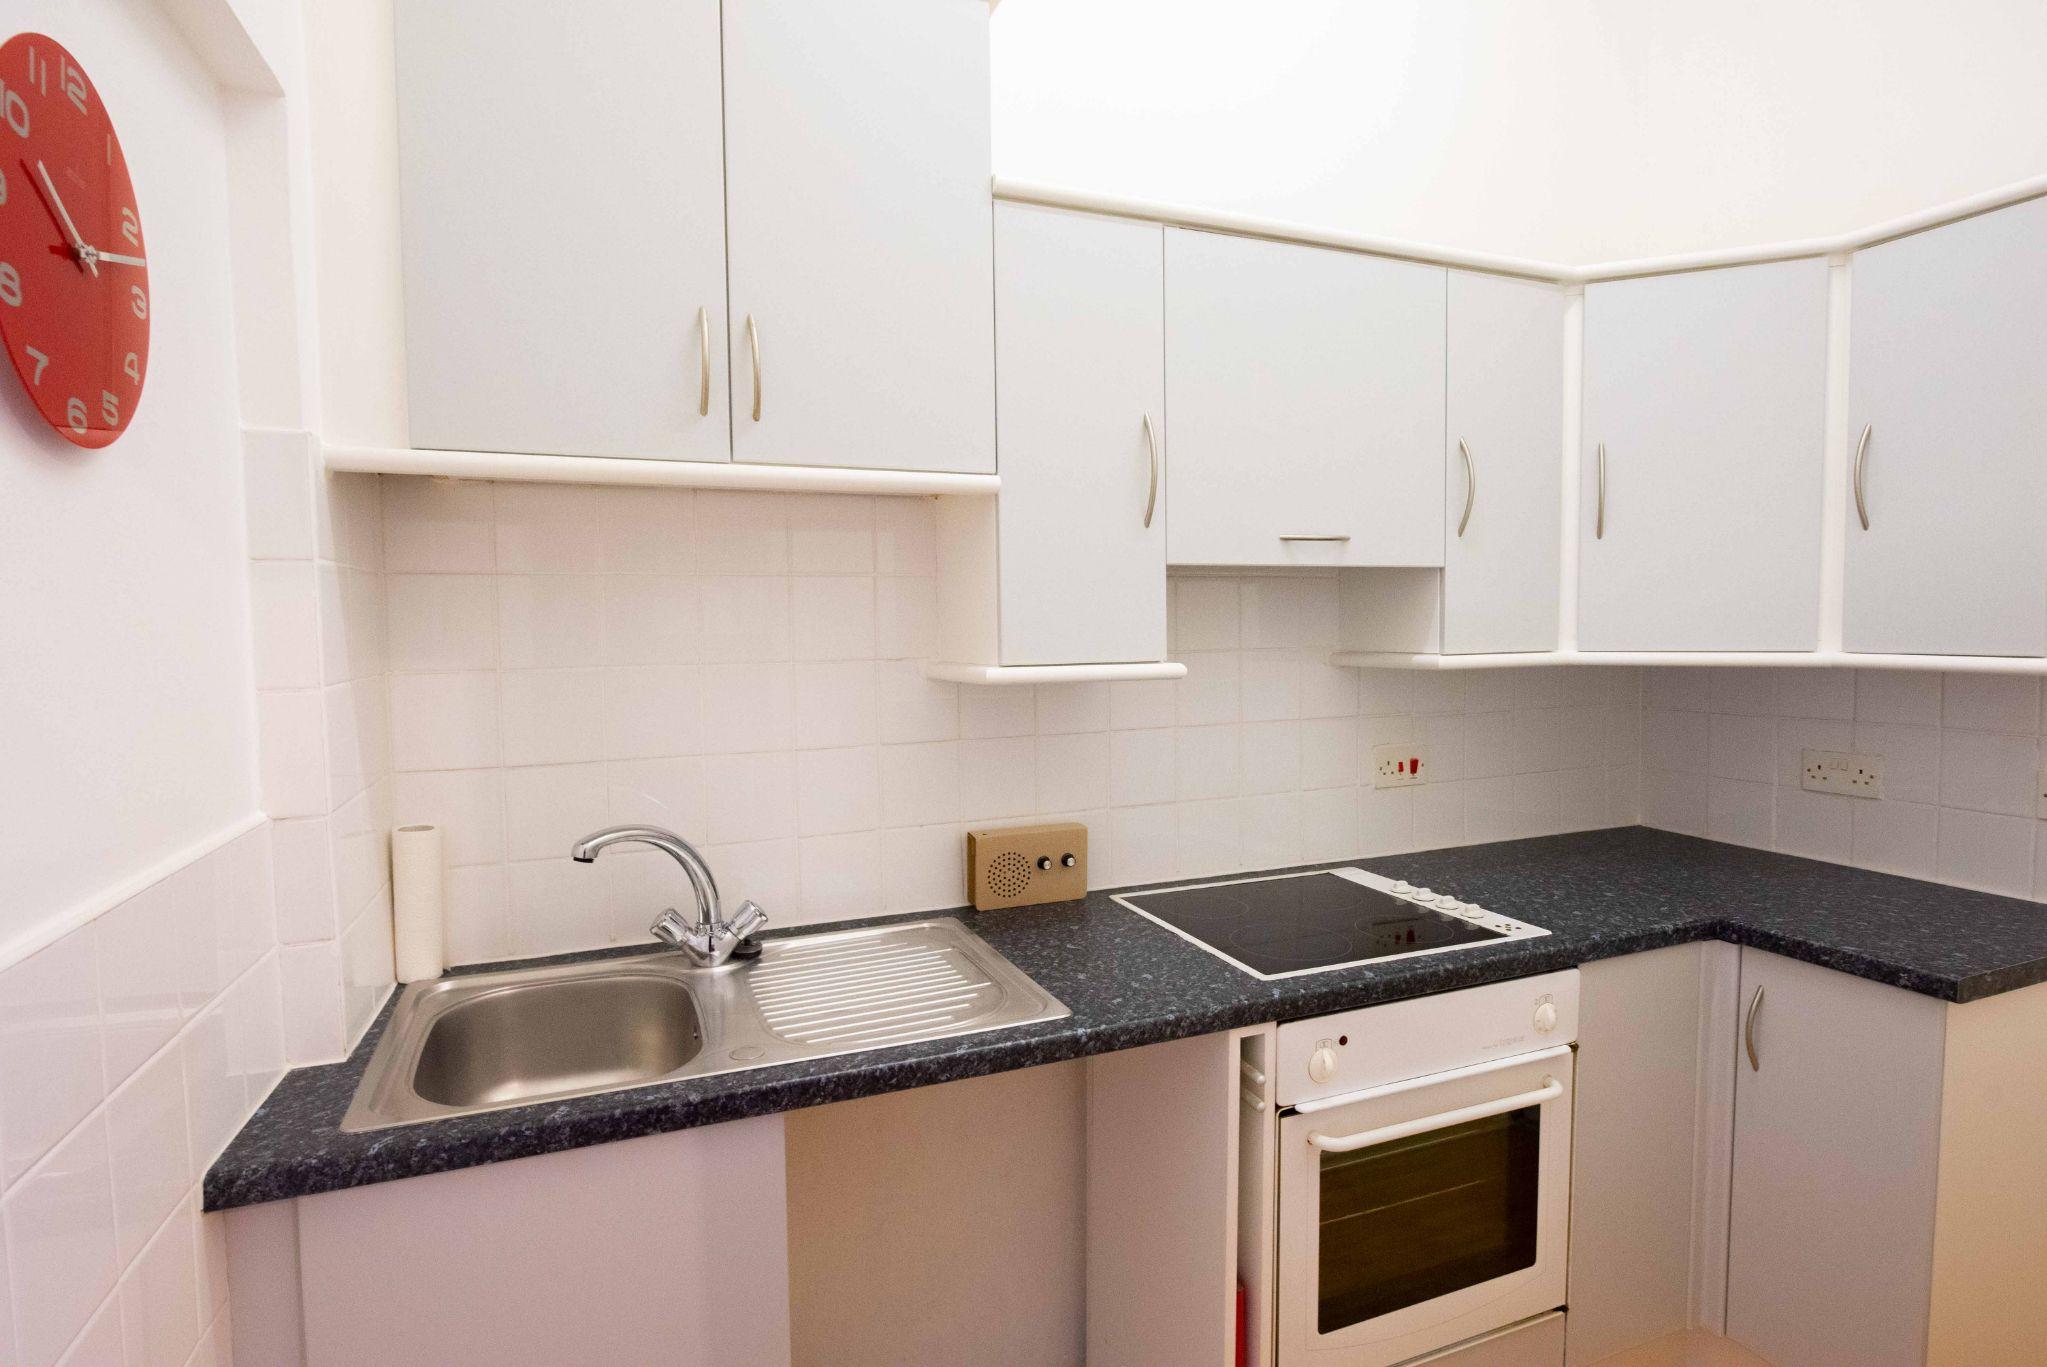 1 bedroom apartment flat/apartment SSTC in Douglas - Property photograph